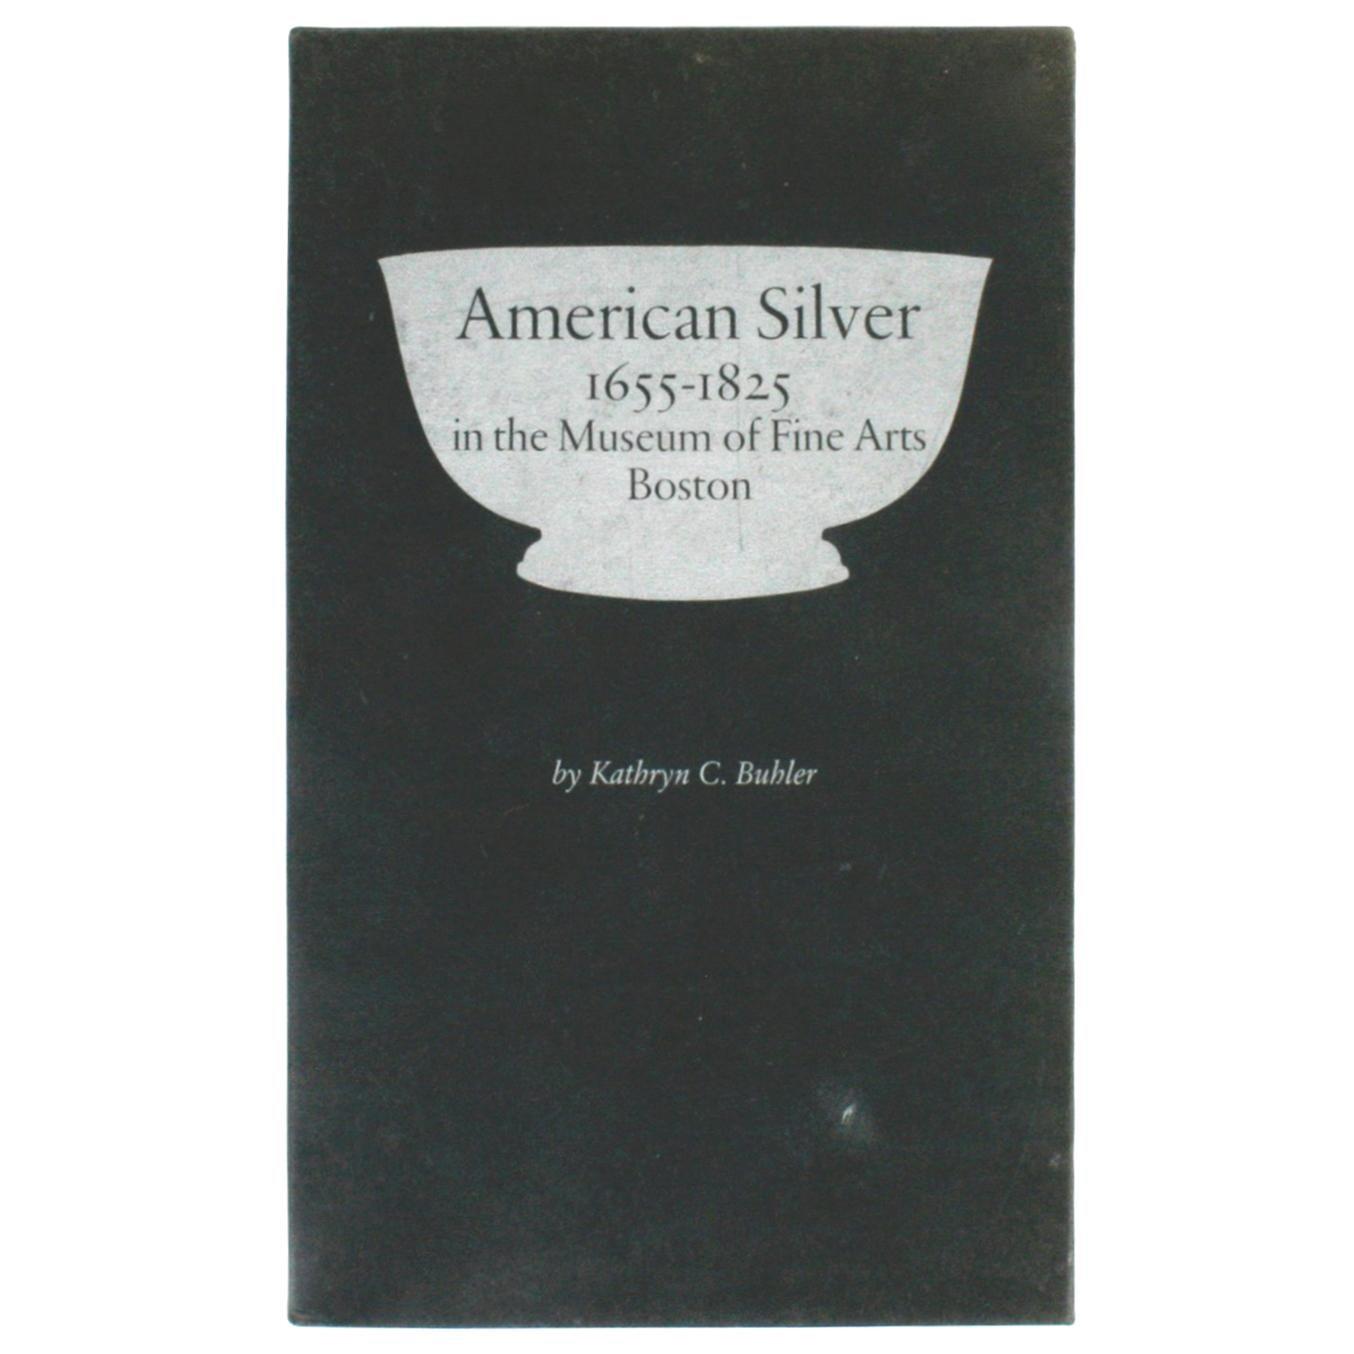 American Silver in the Museum of Fine Arts Boston, Vols. I & II, Signed 1st Ed